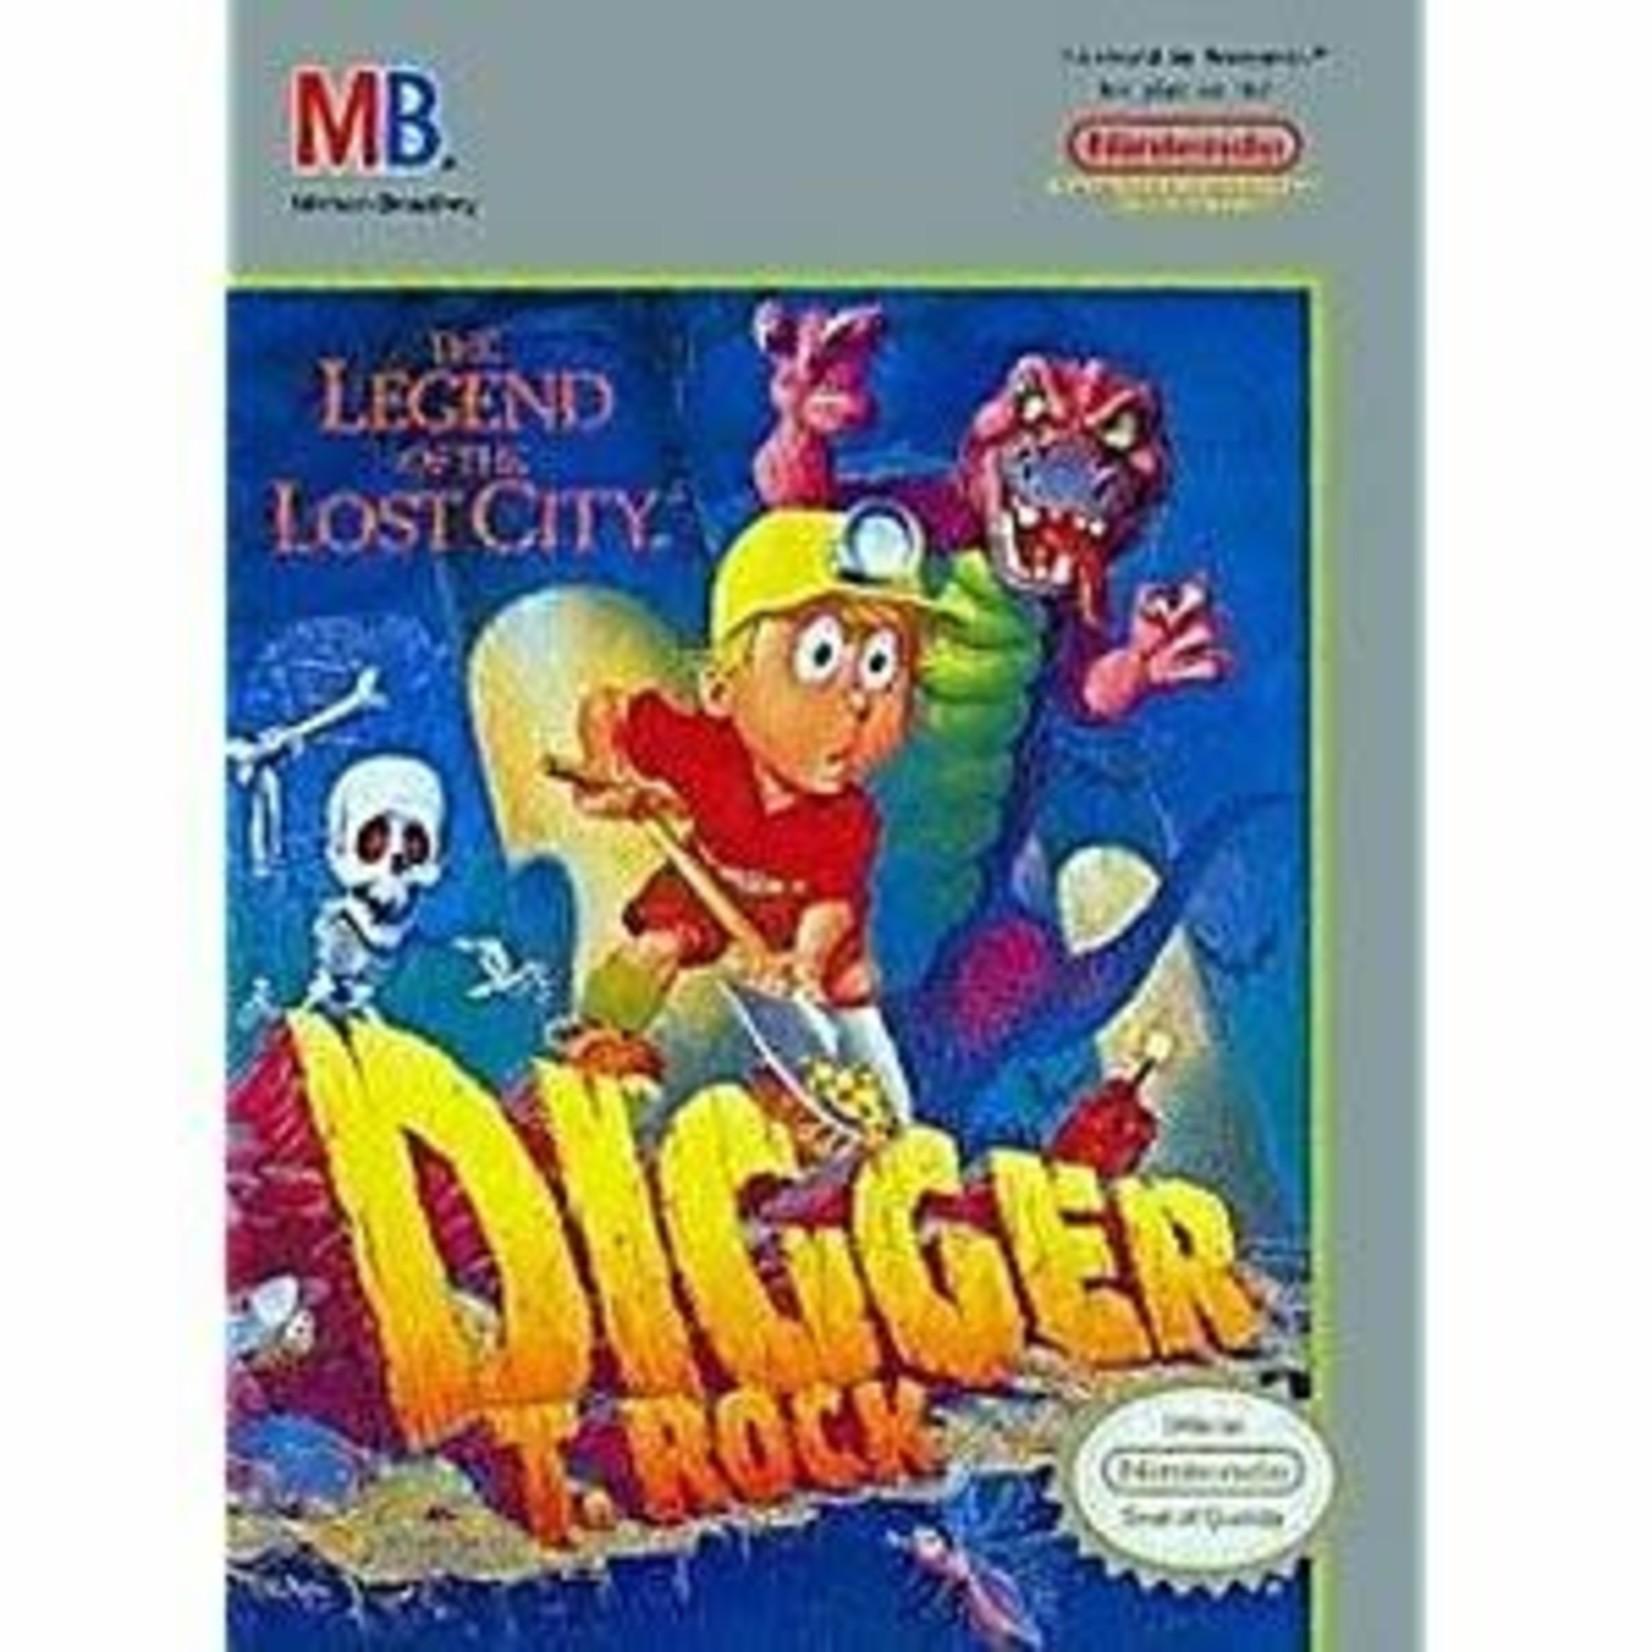 NESu-Digger T Rock (cartridge)